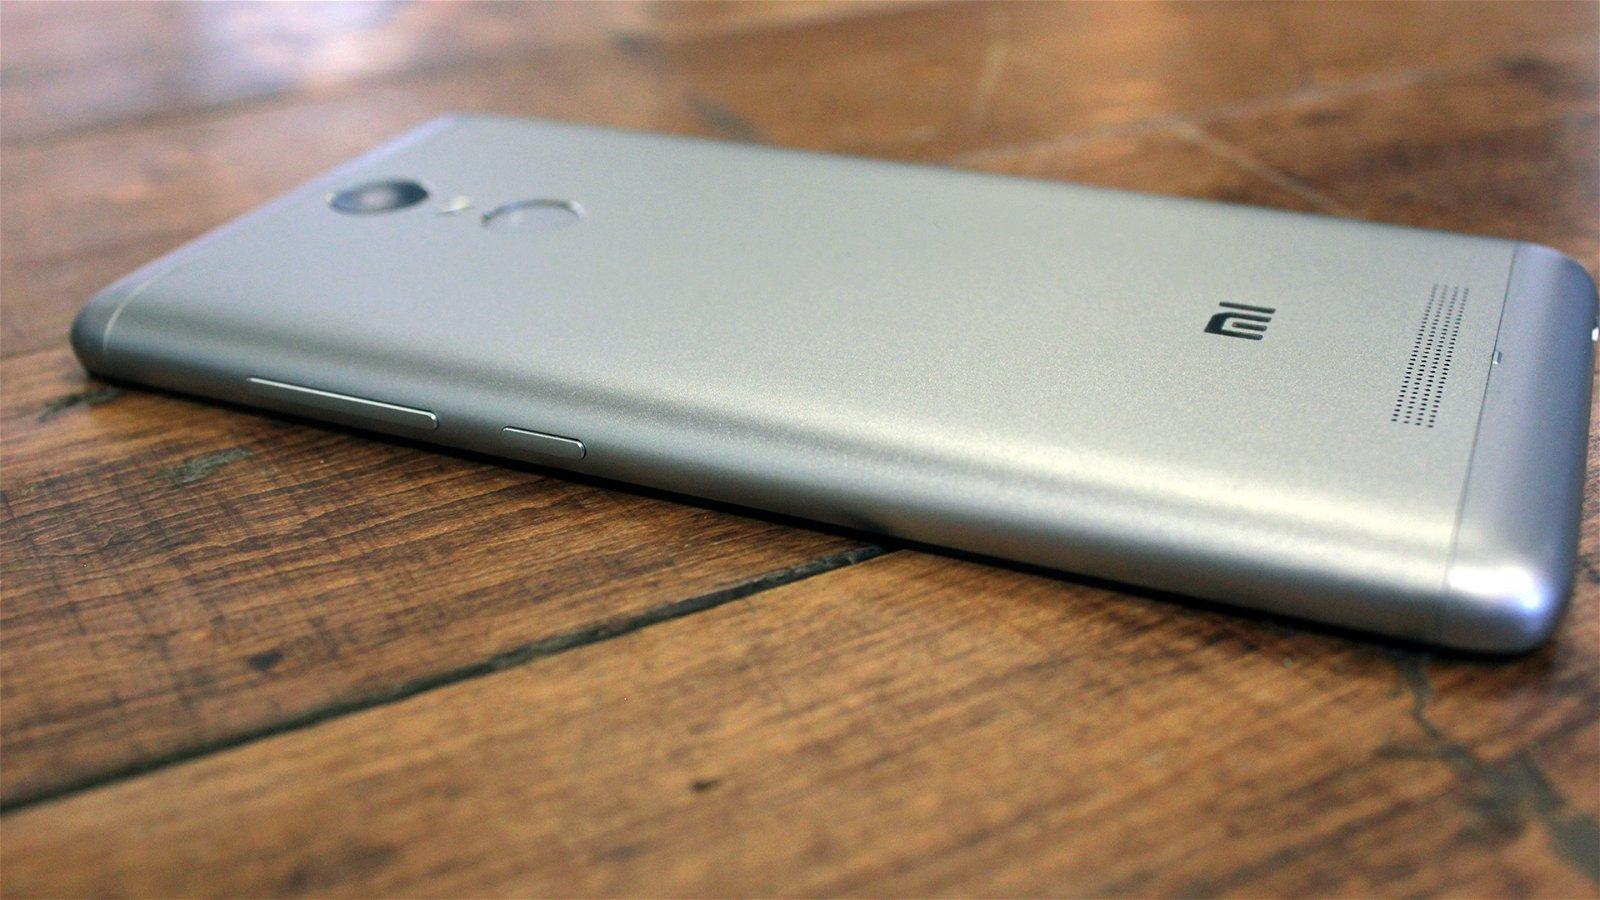 Xiaomi Redmi Note 3 Pro Hardware Review